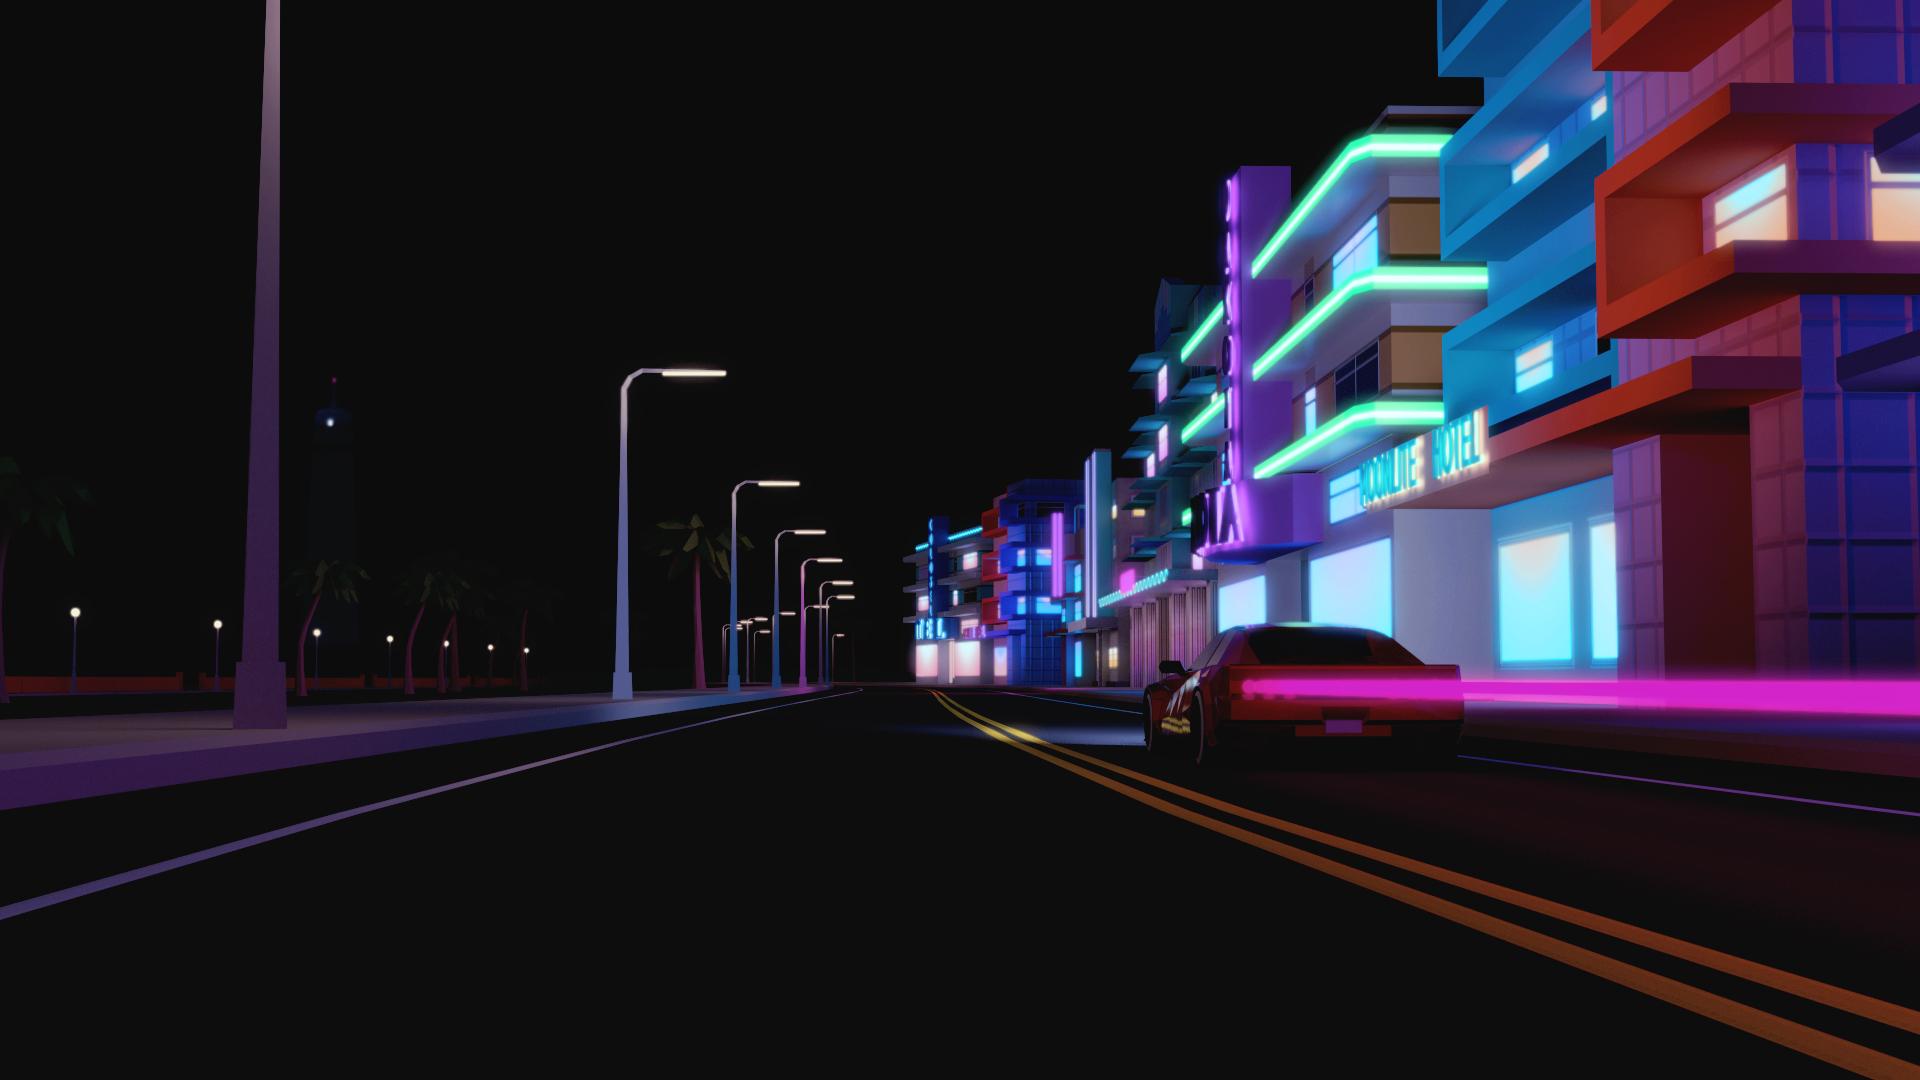 Free Download Grand Theft Auto Vice City Hd Wallpaper 20 1920 X